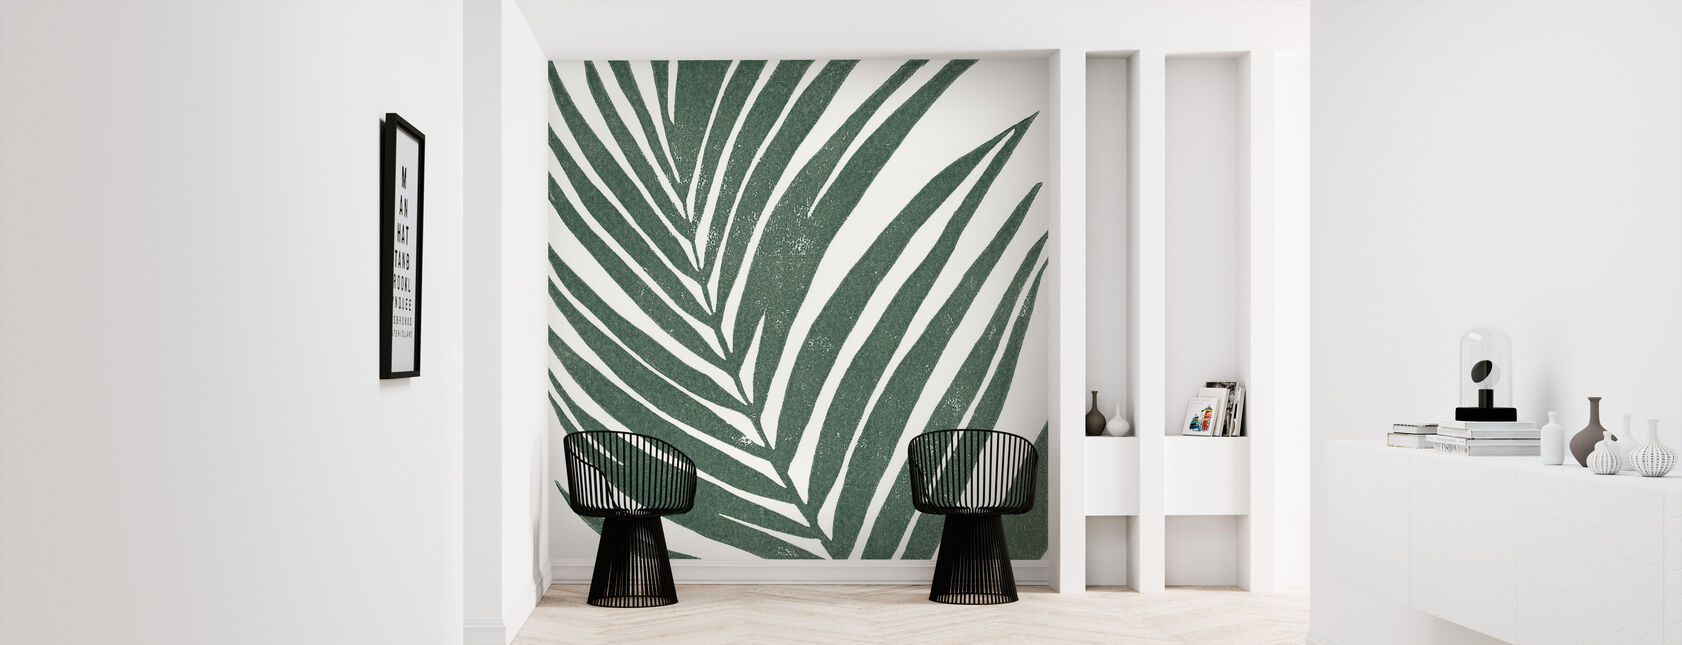 Tropical Treasures II - Wallpaper - Hallway